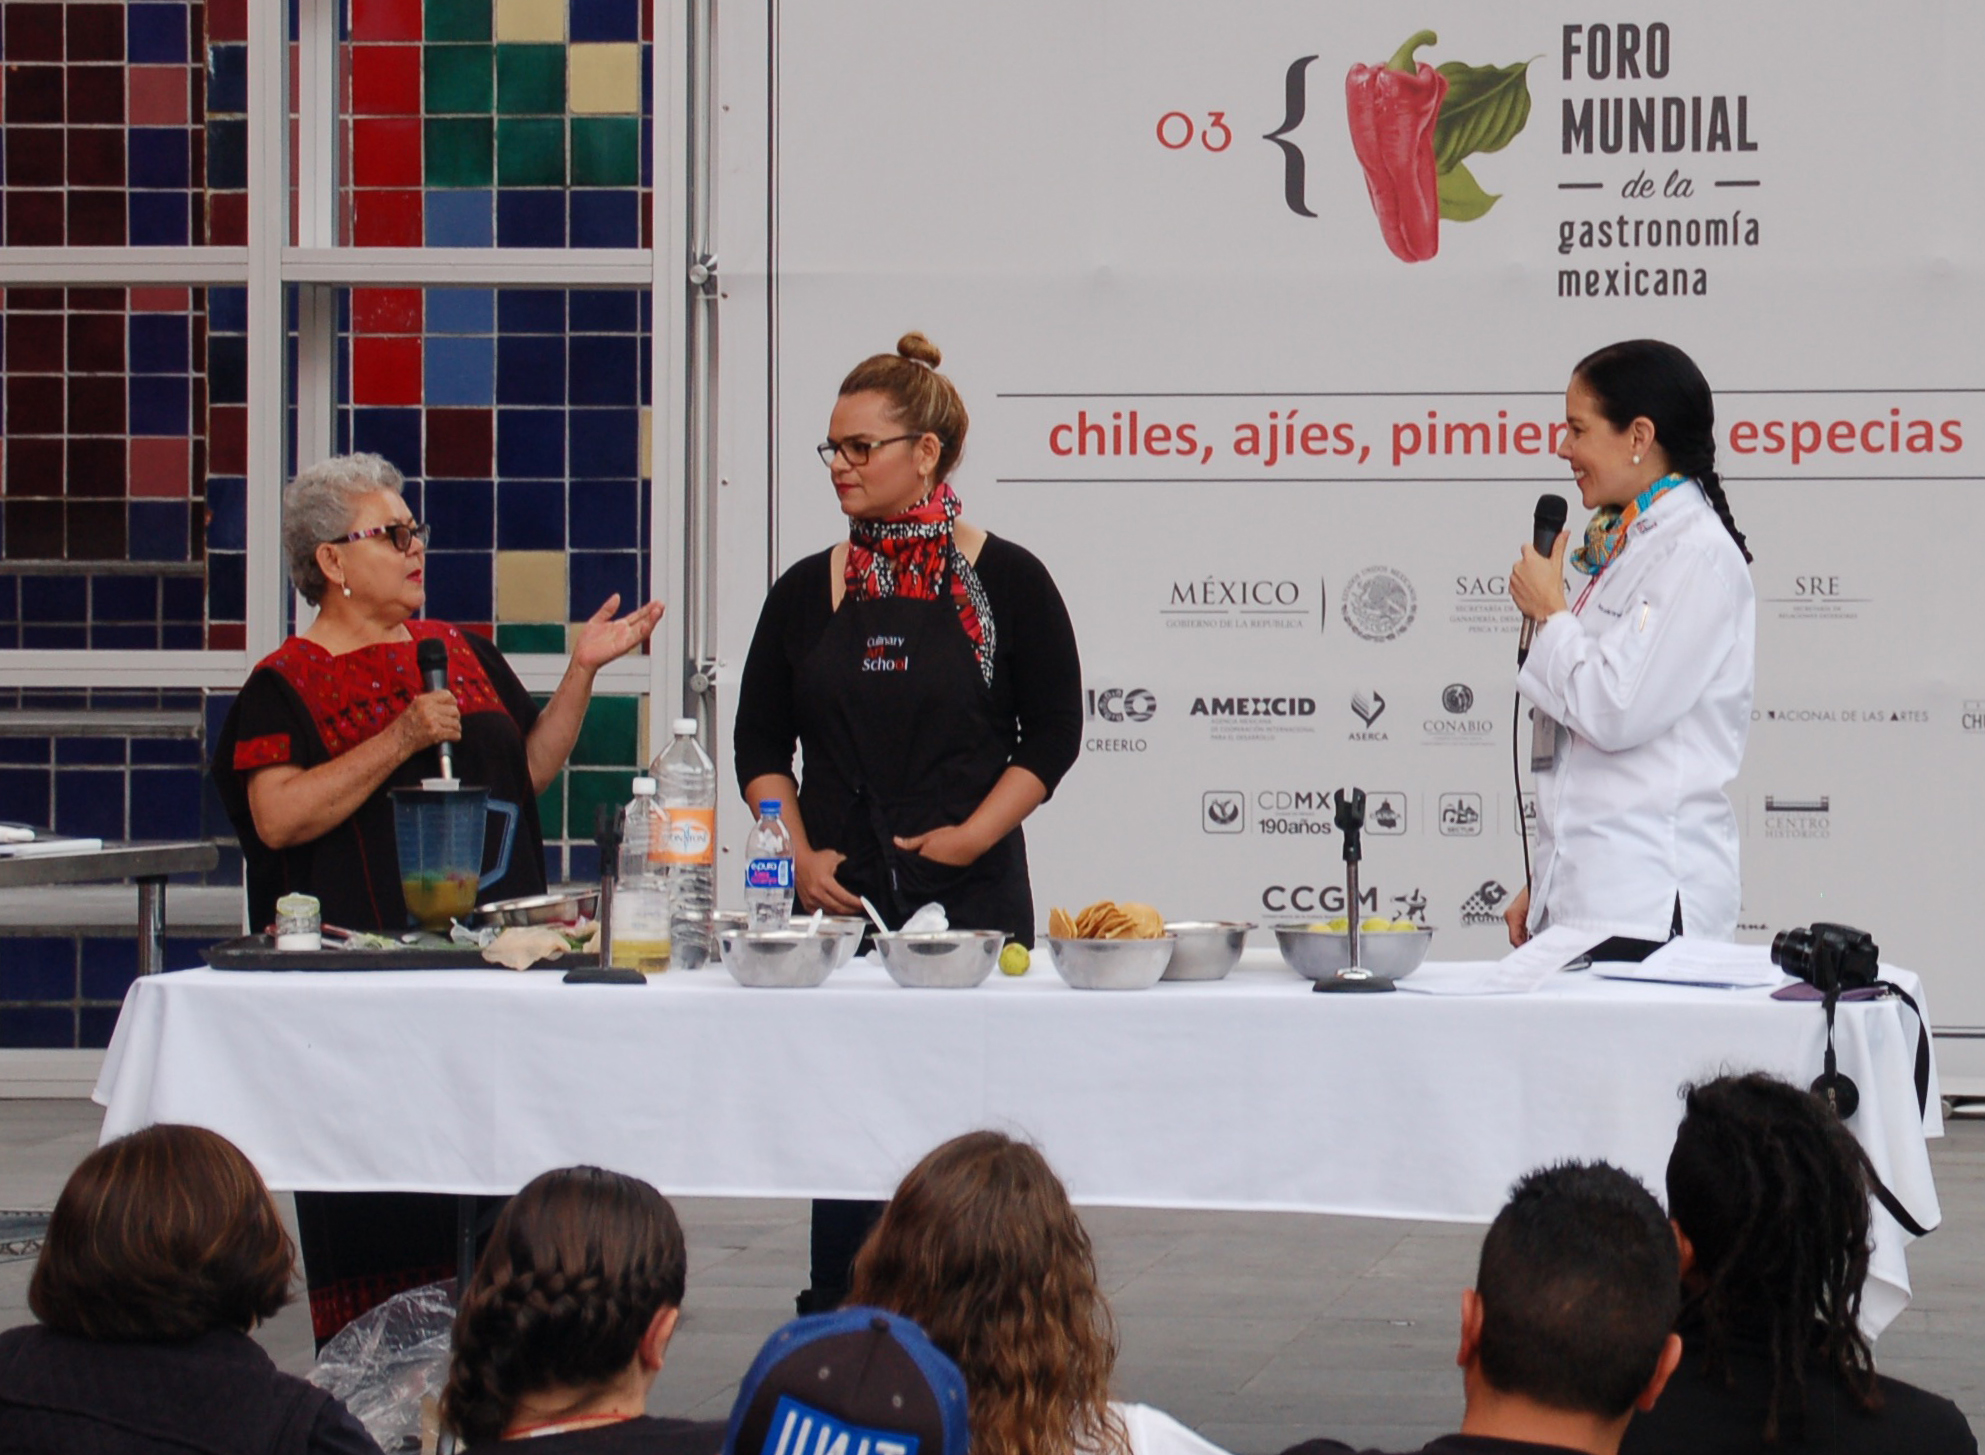 Sabina Bandera, MariJane Watson and Ana Laura Martînez discuss and prepare regional salsas at FMGM 2015, Mexico City, Mexico